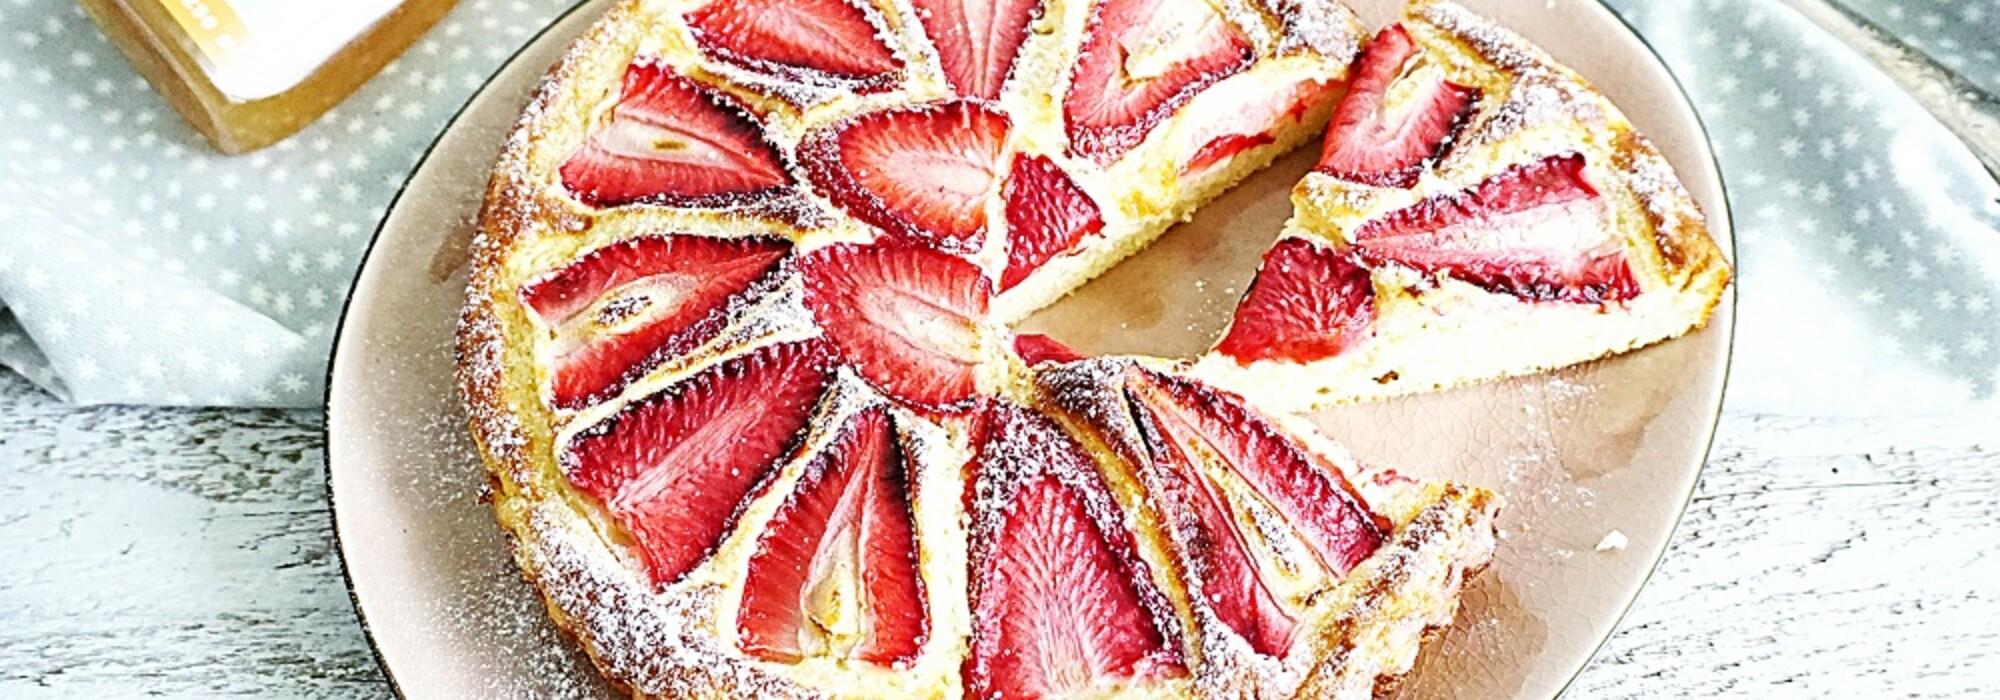 Suikervrije en koolhydraatarme aardbeiencake